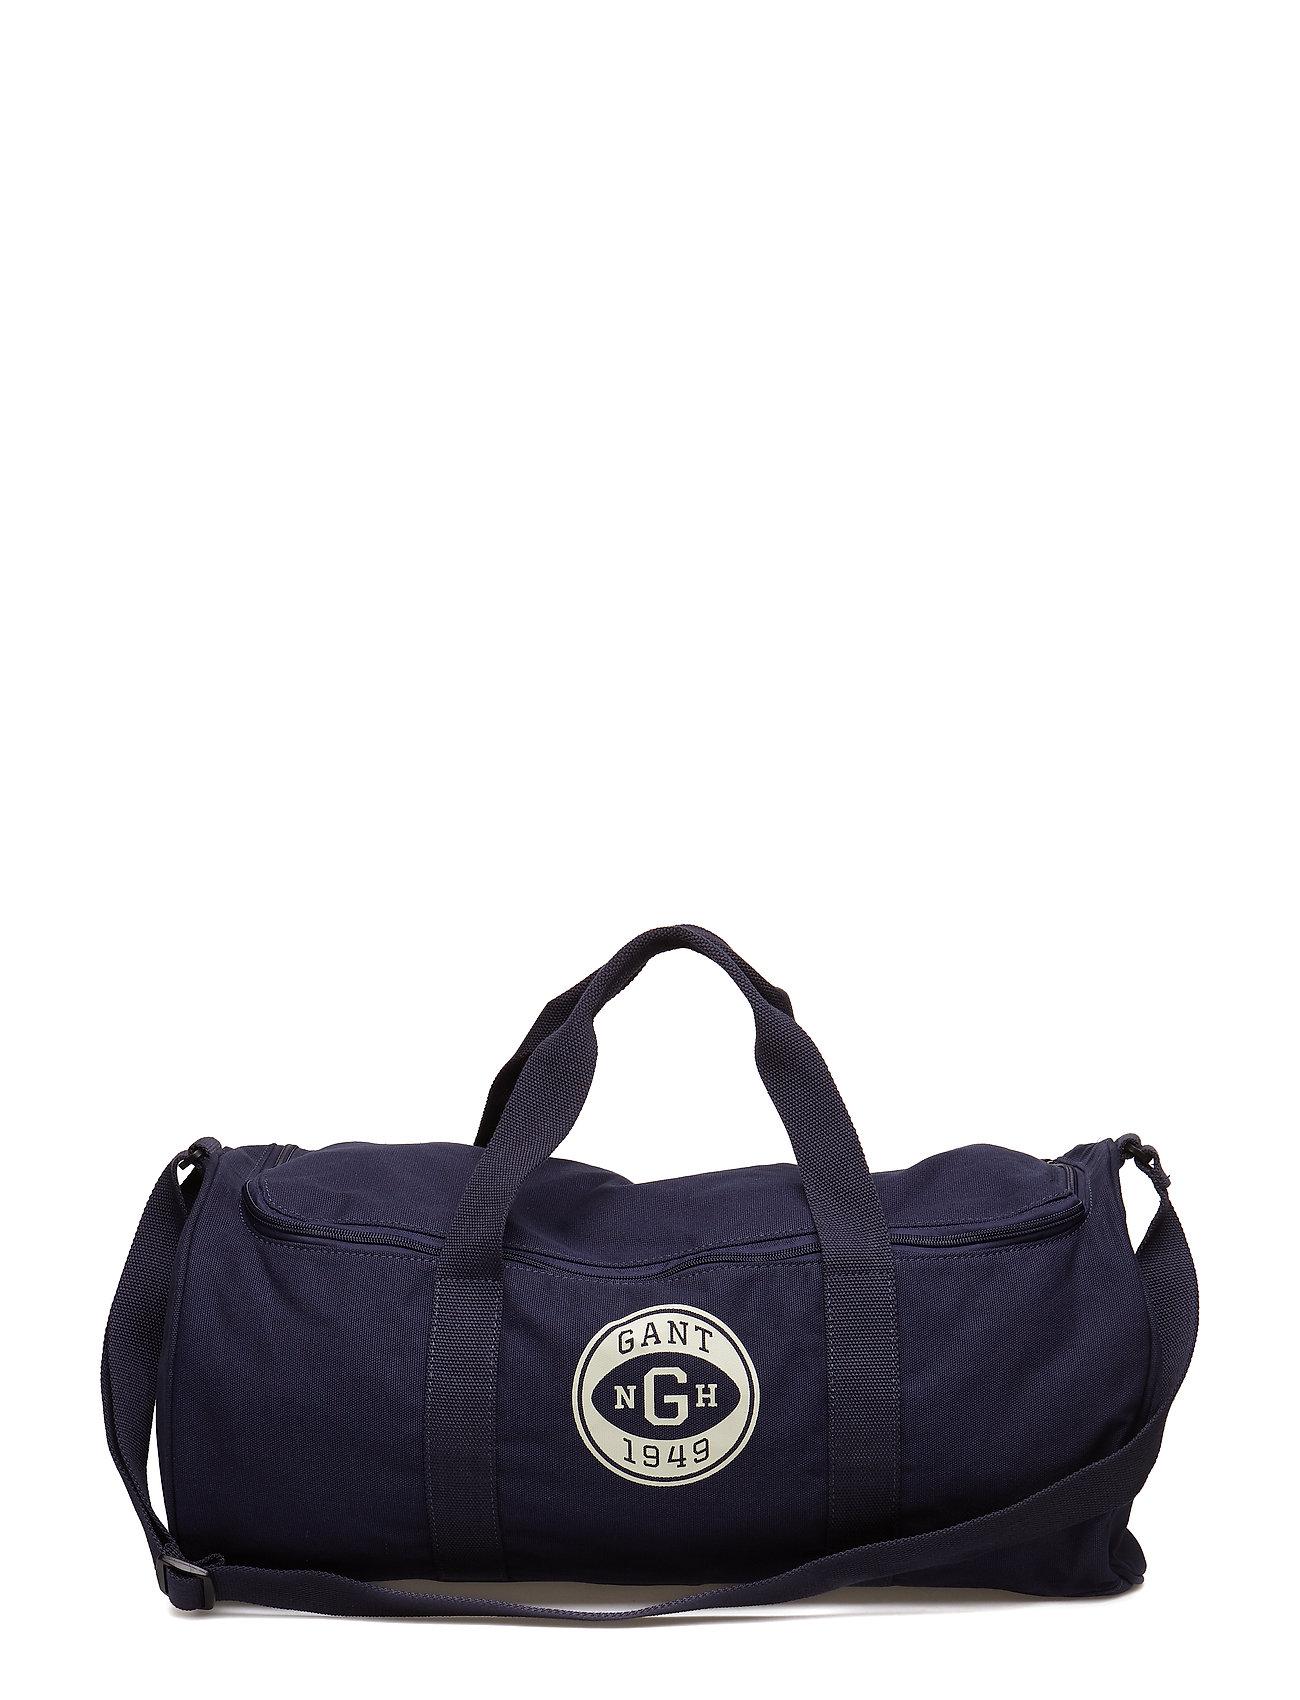 GANT O1. THE RUGBY BAG